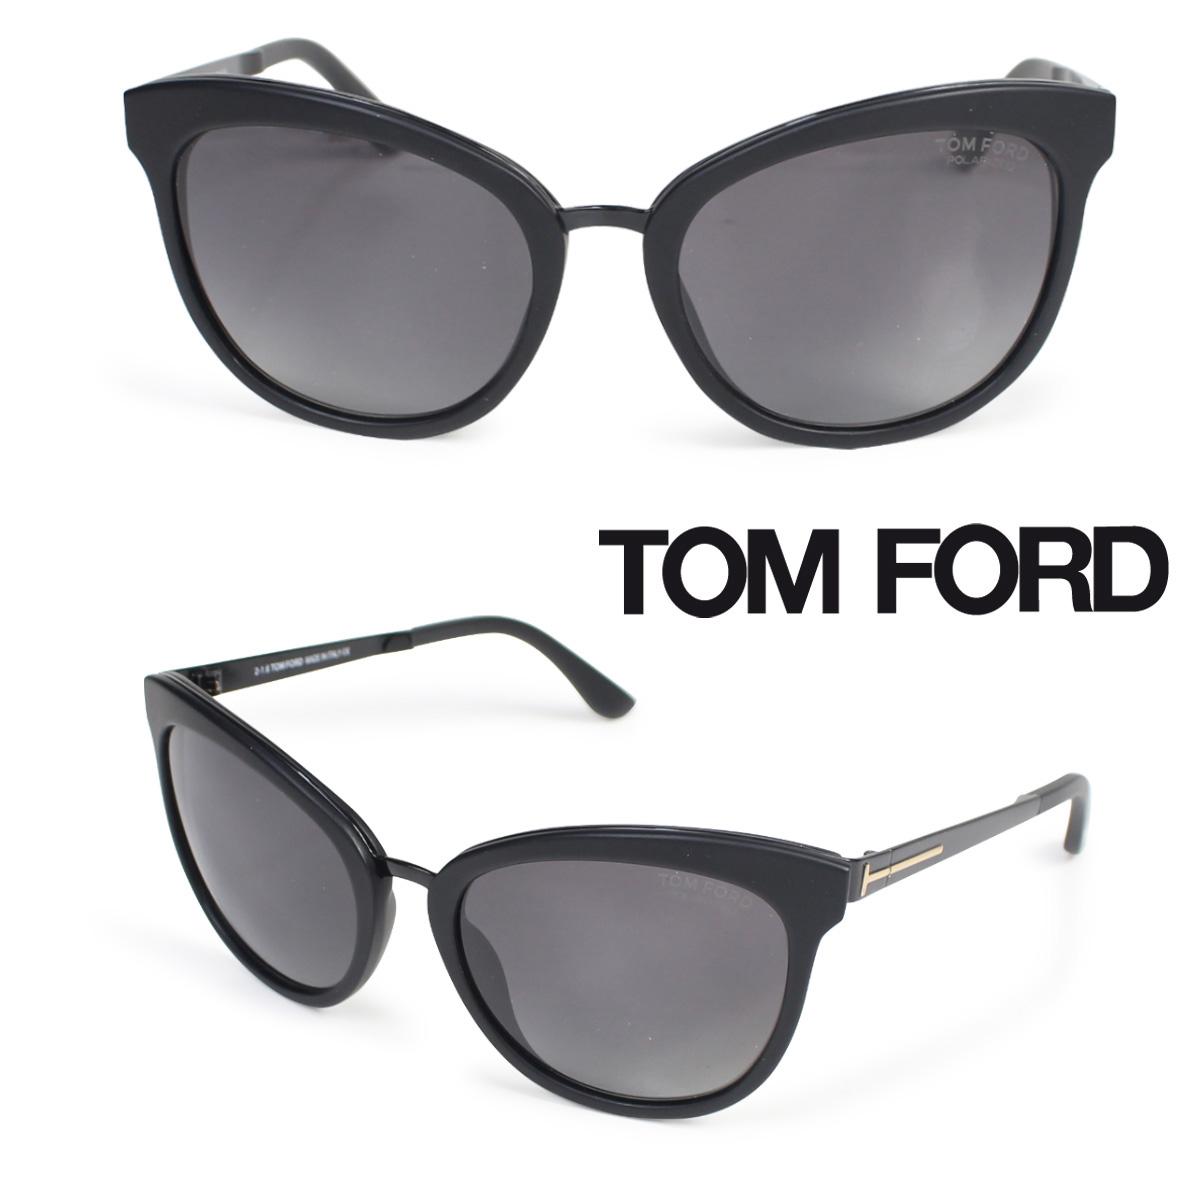 TOM FORD トムフォード サングラス メガネ レディース アイウェア FT0461 EMMA SUNGLASSES ブラック [177]